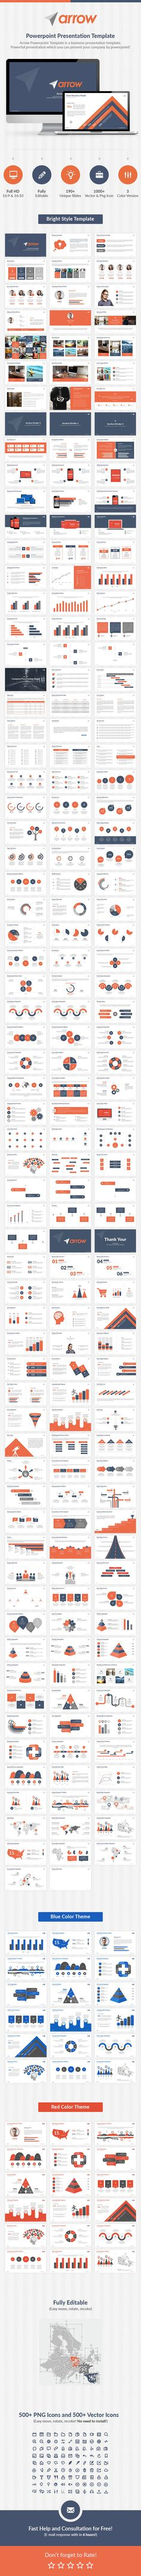 Arrow Powerpoint Presentation Template (PowerPoint Templates)